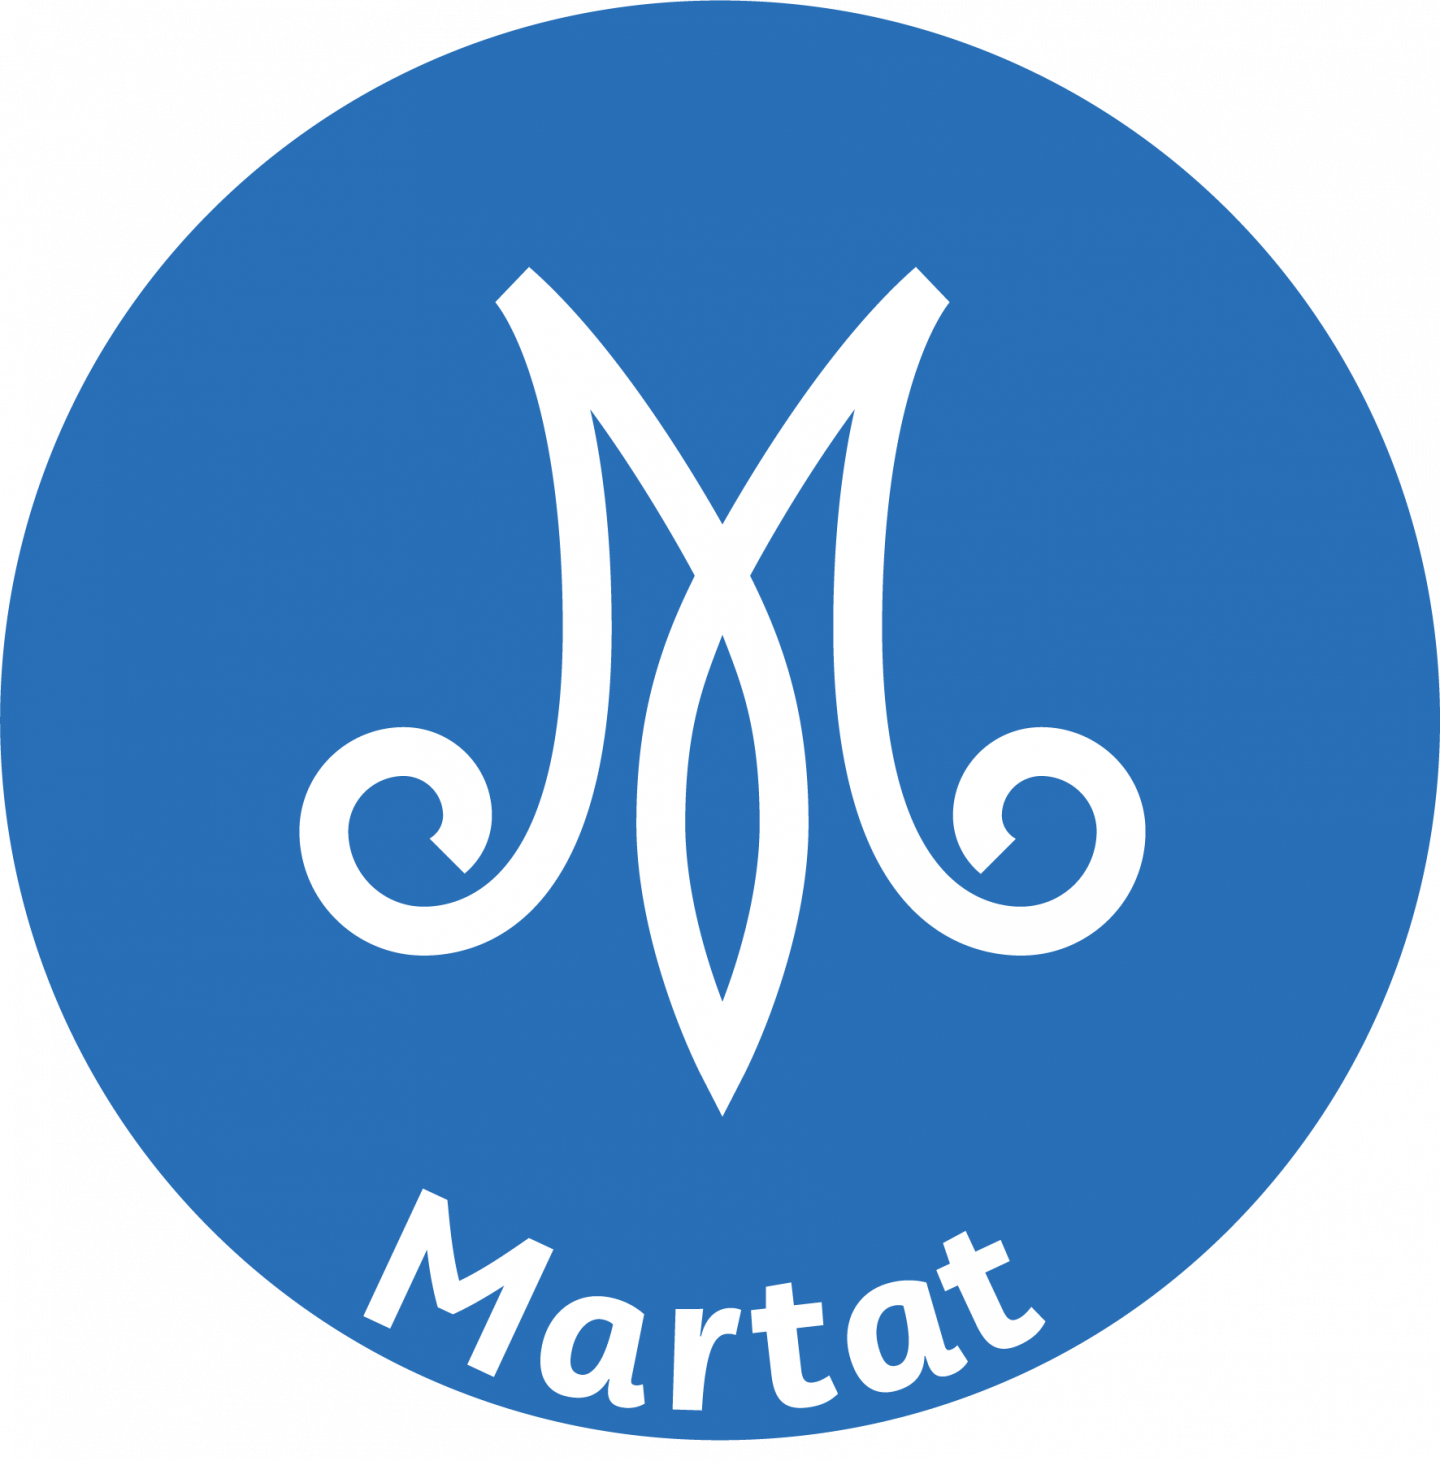 Martat-2020-iso-logo-liitto-sininen-PNG